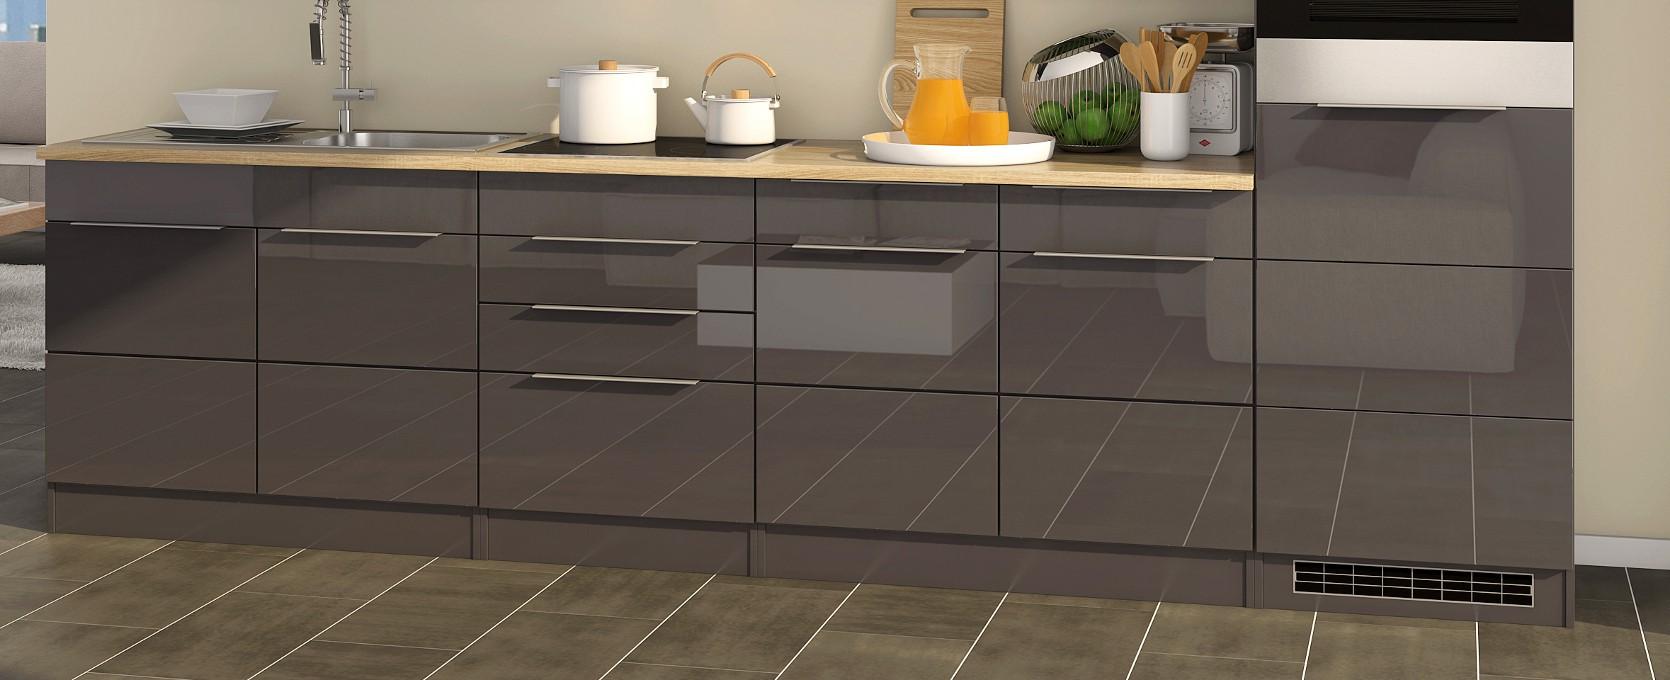 k chenzeile hamburg k chenblock mit elektro ger ten 320 cm grau ebay. Black Bedroom Furniture Sets. Home Design Ideas